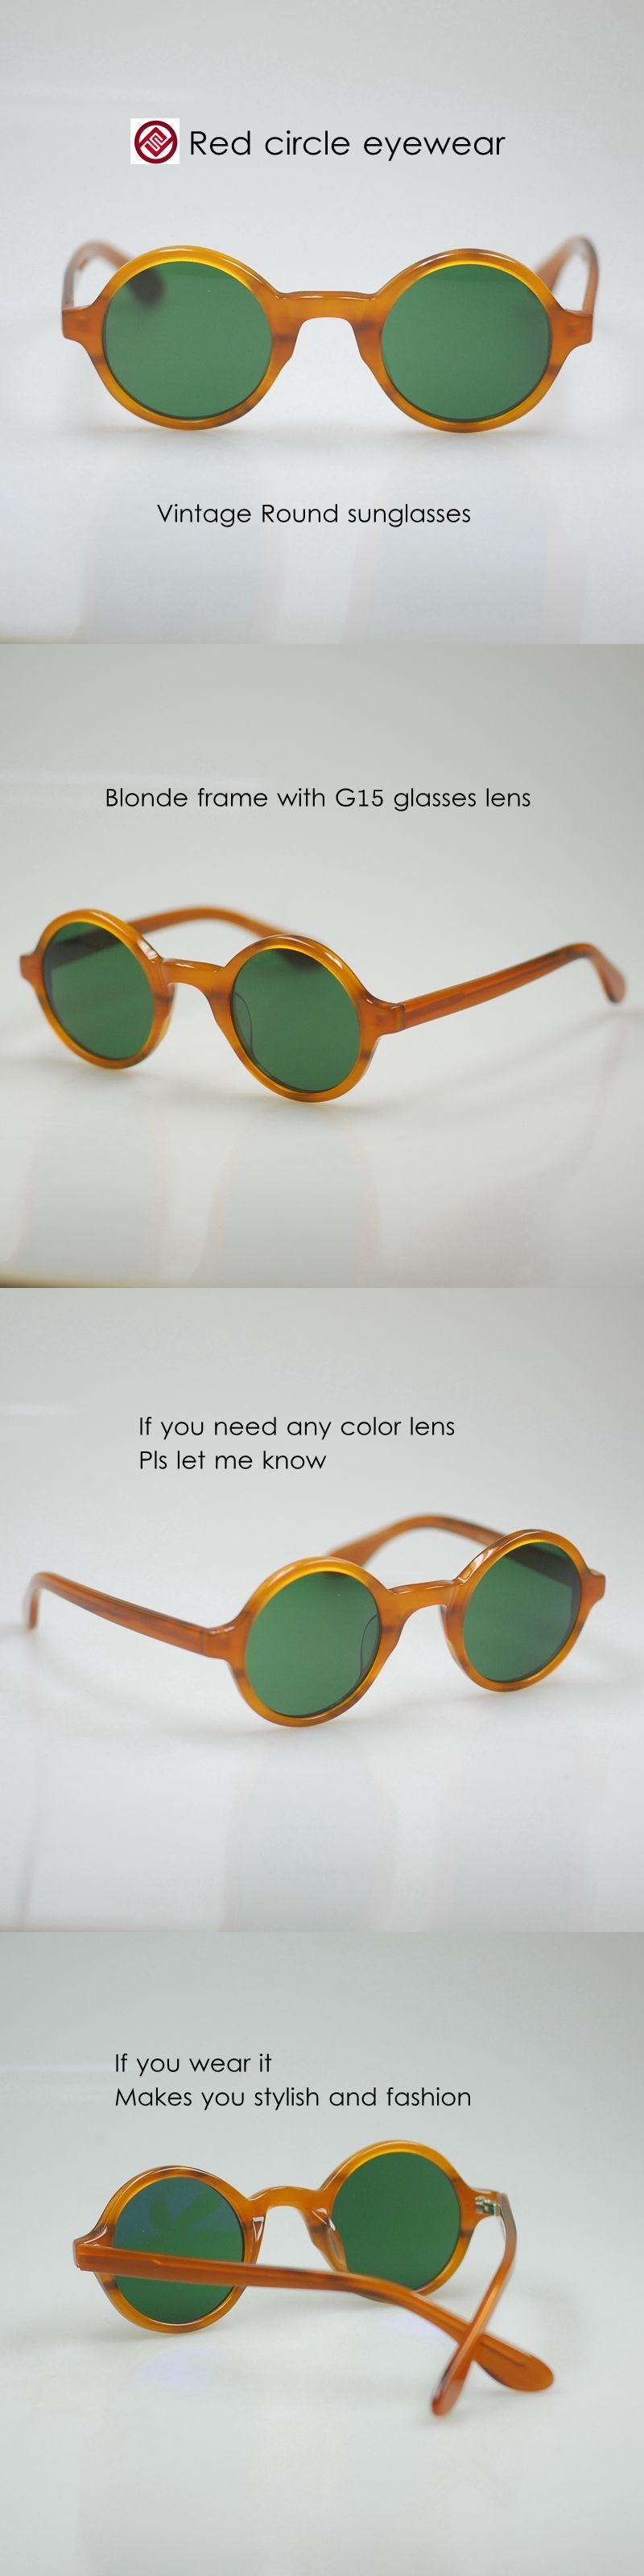 0408f55c56 Retro Vintage sunglasses Johnny Depp glasses BLONDE frame round green glass  lens